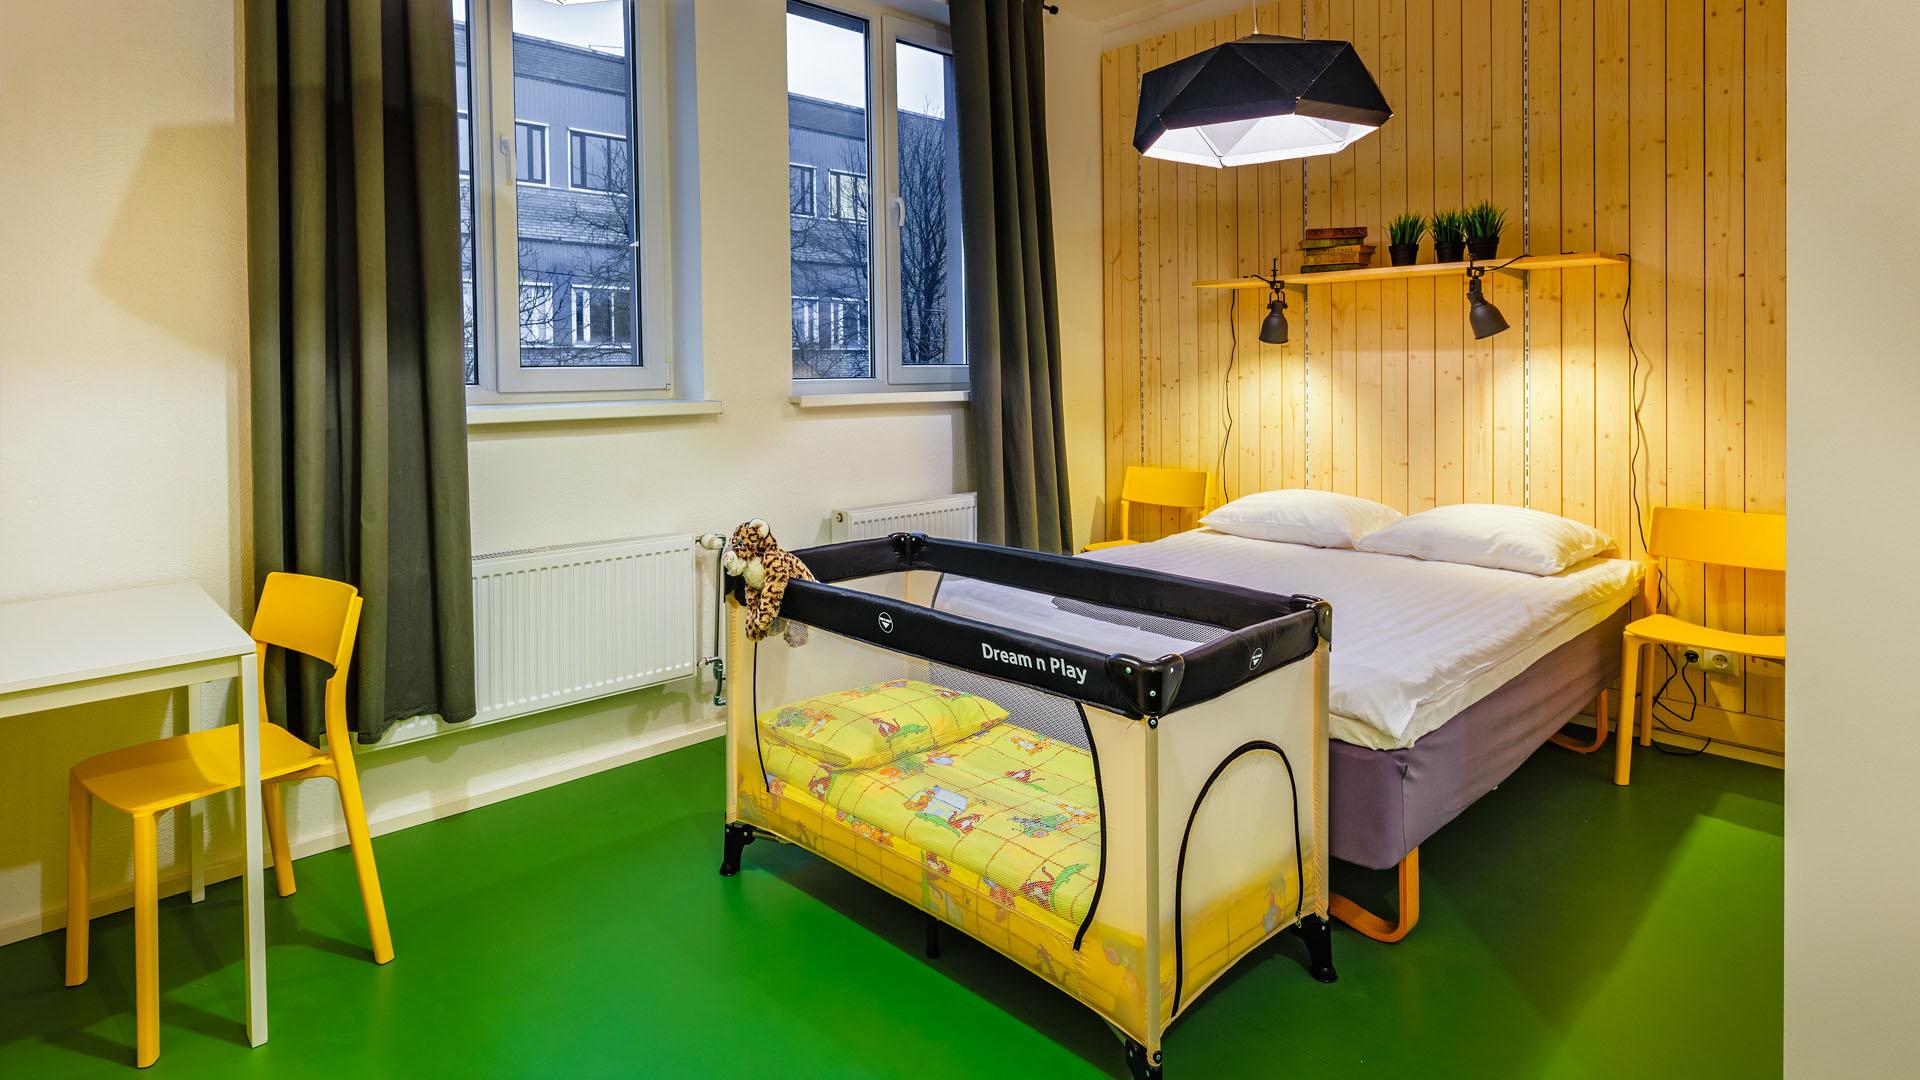 Hektor_hostel_family_room